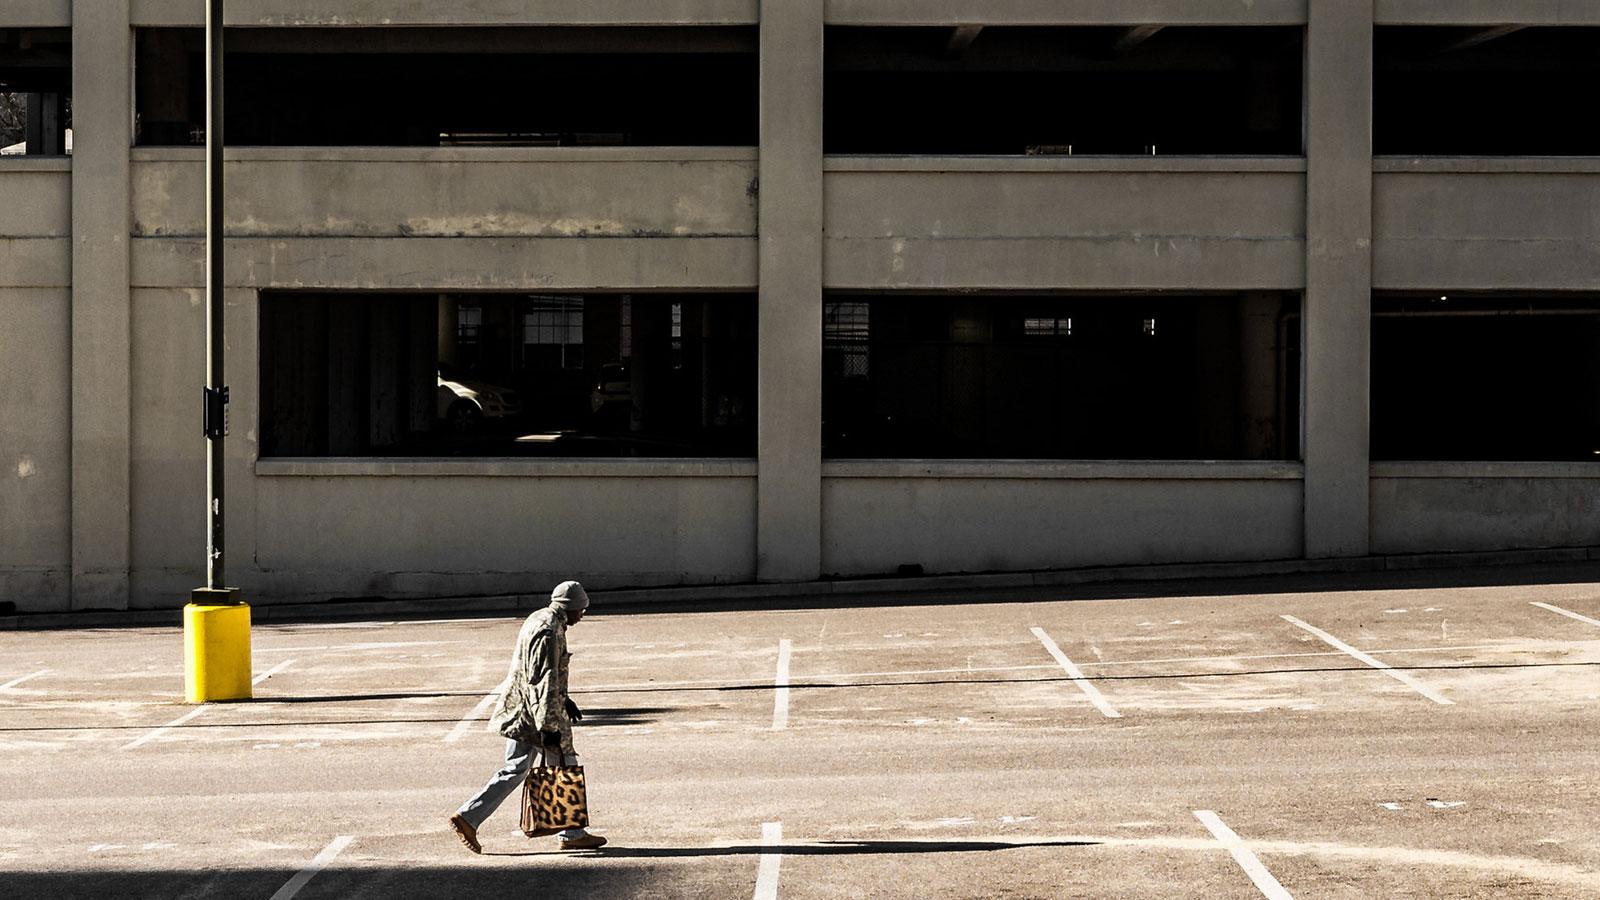 Man walking on cement